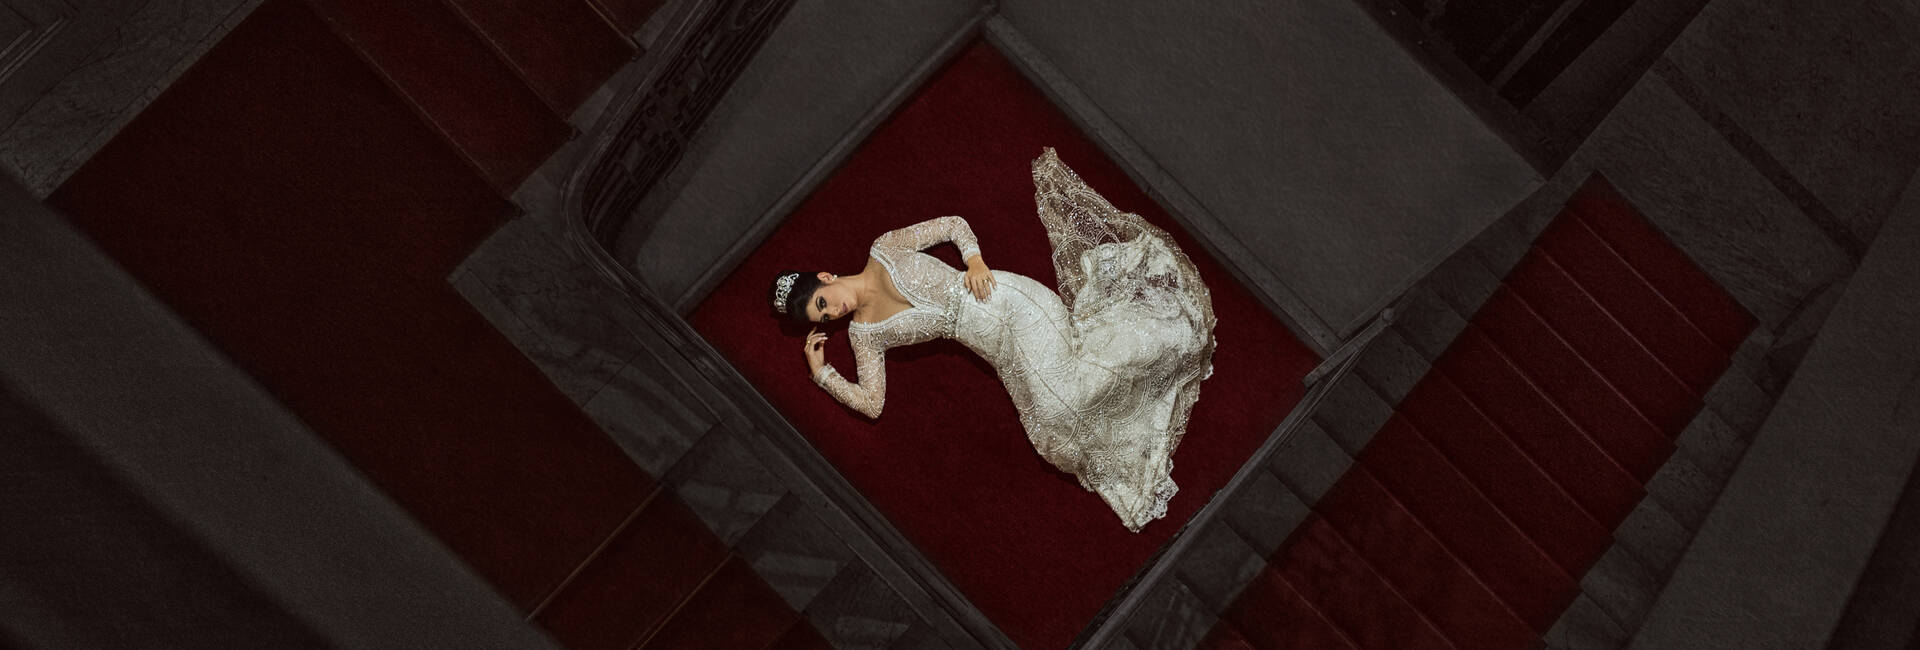 Casamentos de Gabriela e Kaio